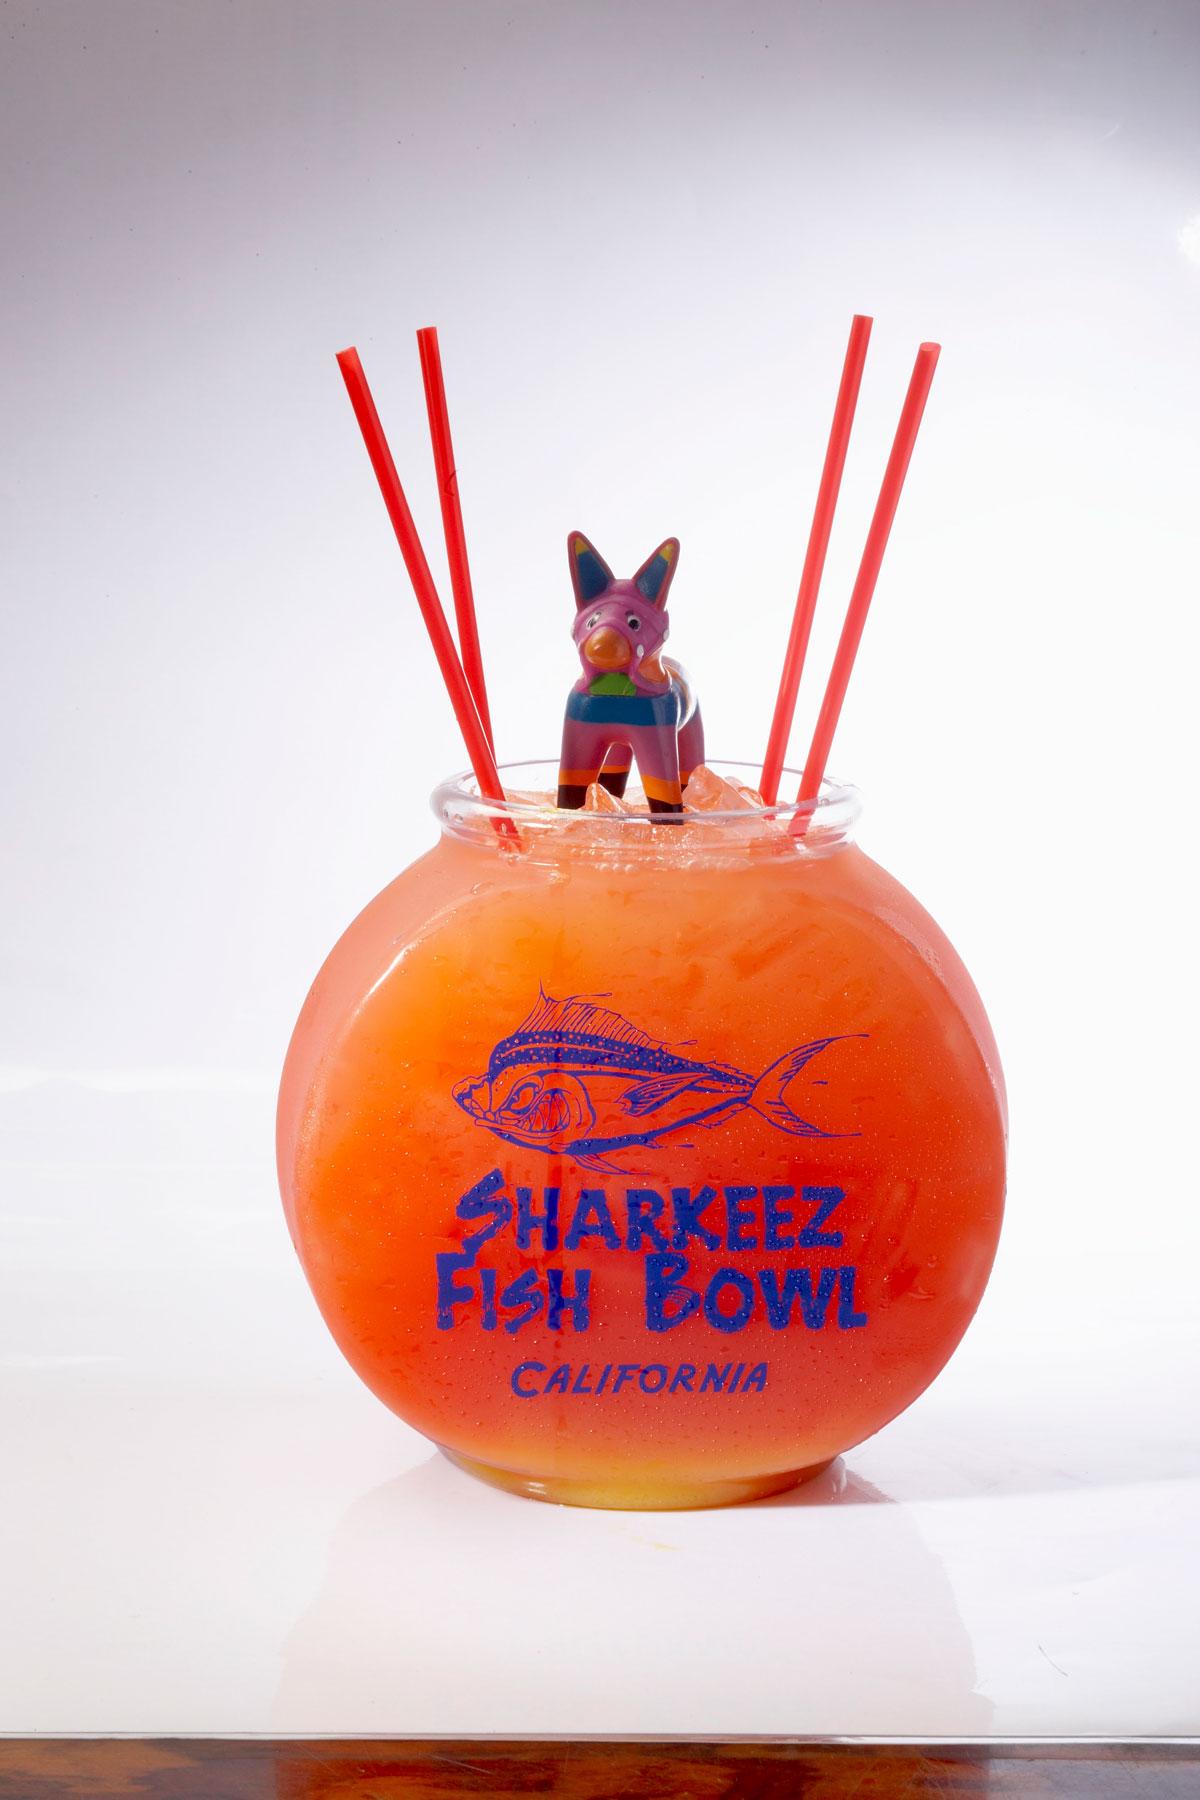 Sharkeez-2